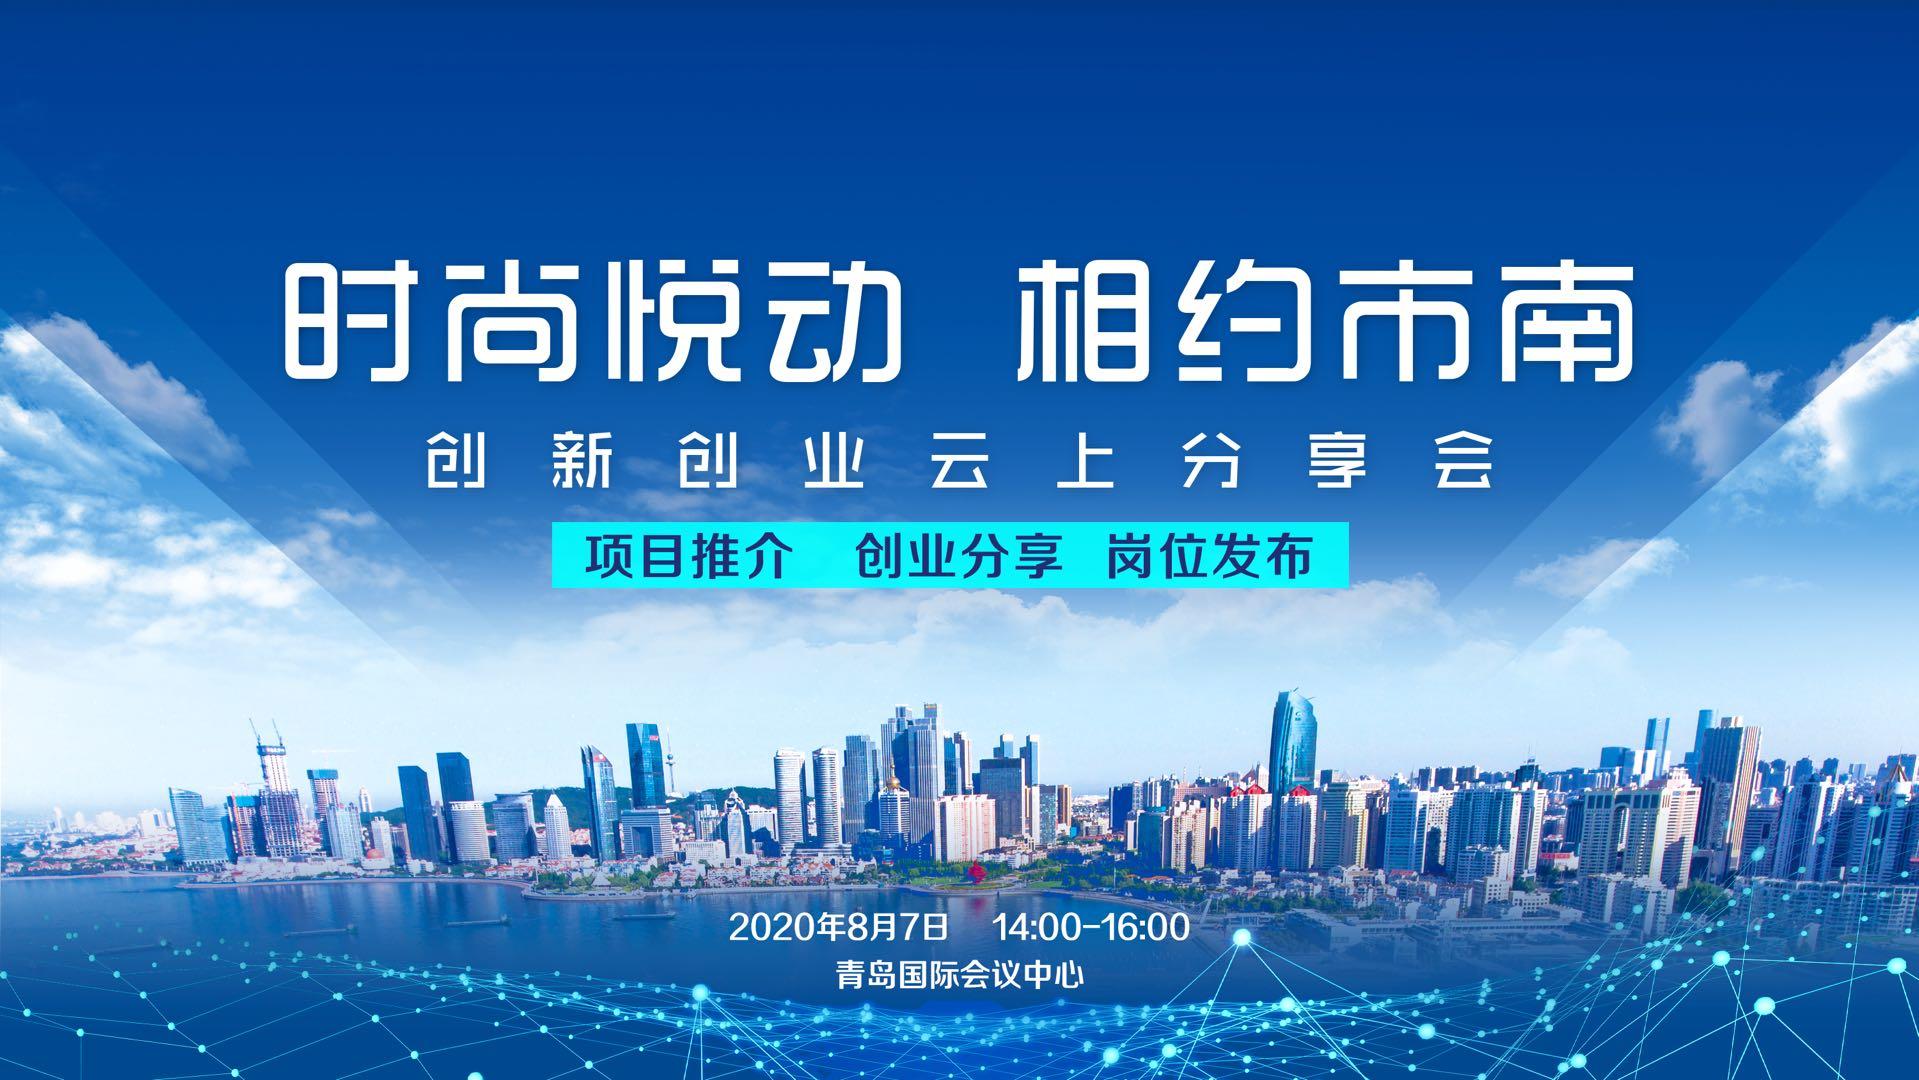 http://live.qingdaonews.com/live/public/attachs/live/202008/07/aedd07298e42b036c4ff99cae458aa00430429b81596777896.jpg